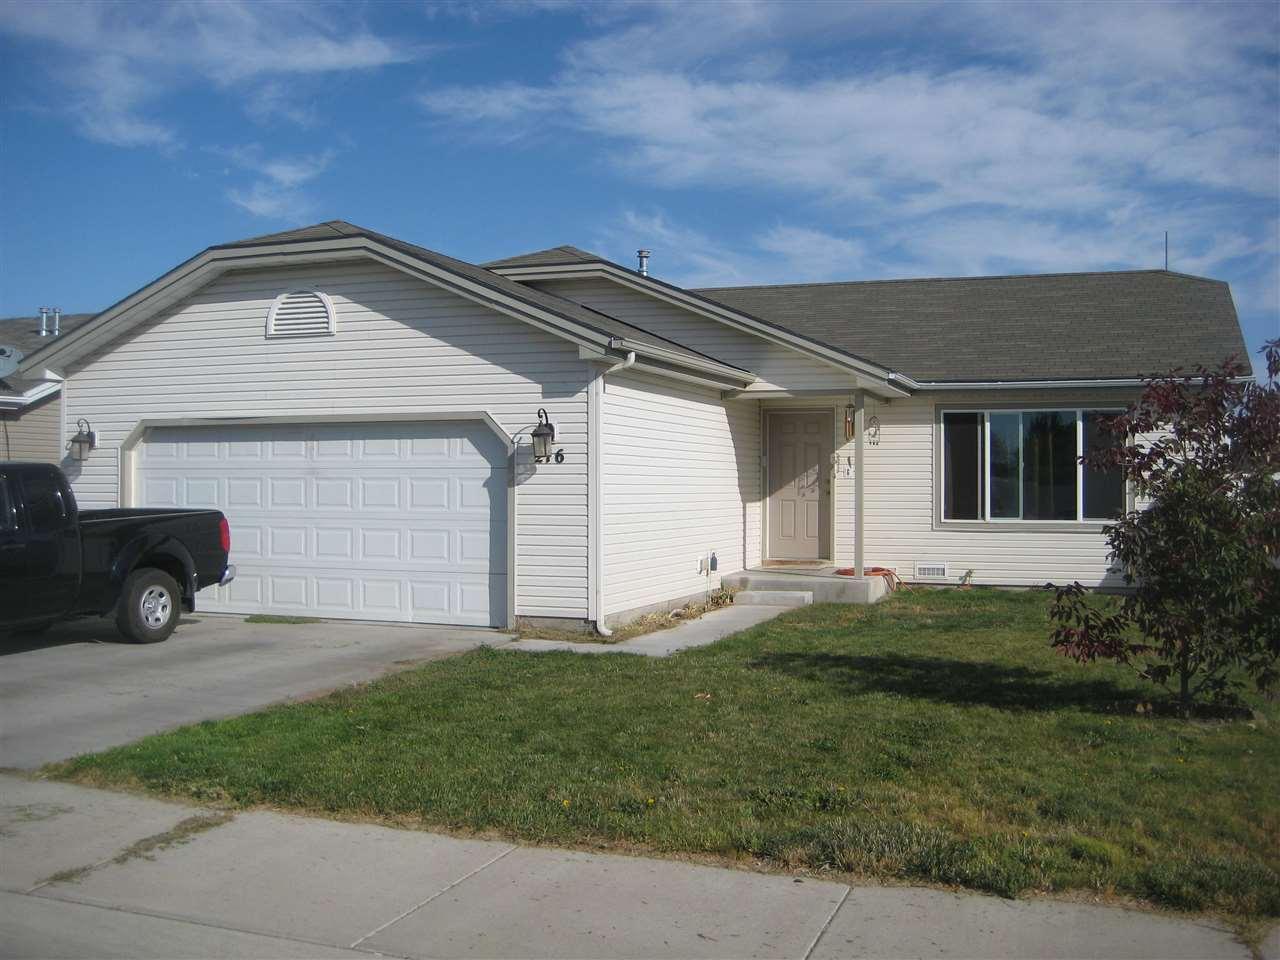 216 Sevensprings Avenue, Twin Falls, ID 83301